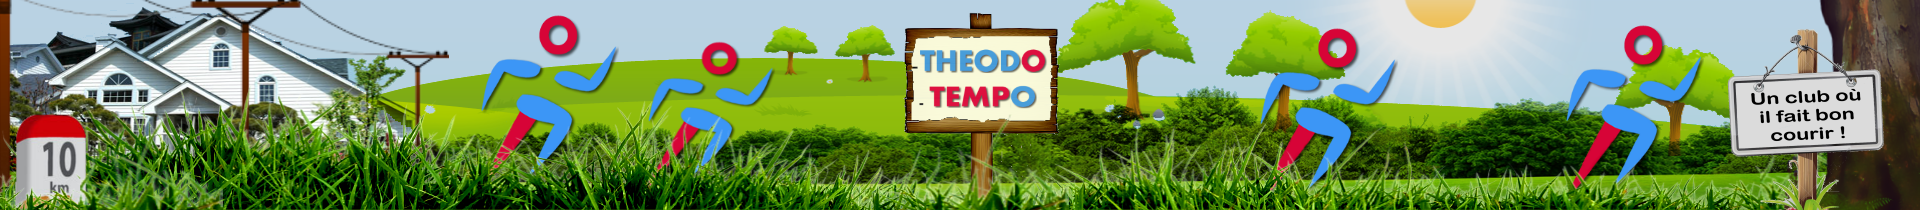 Theodo Tempo